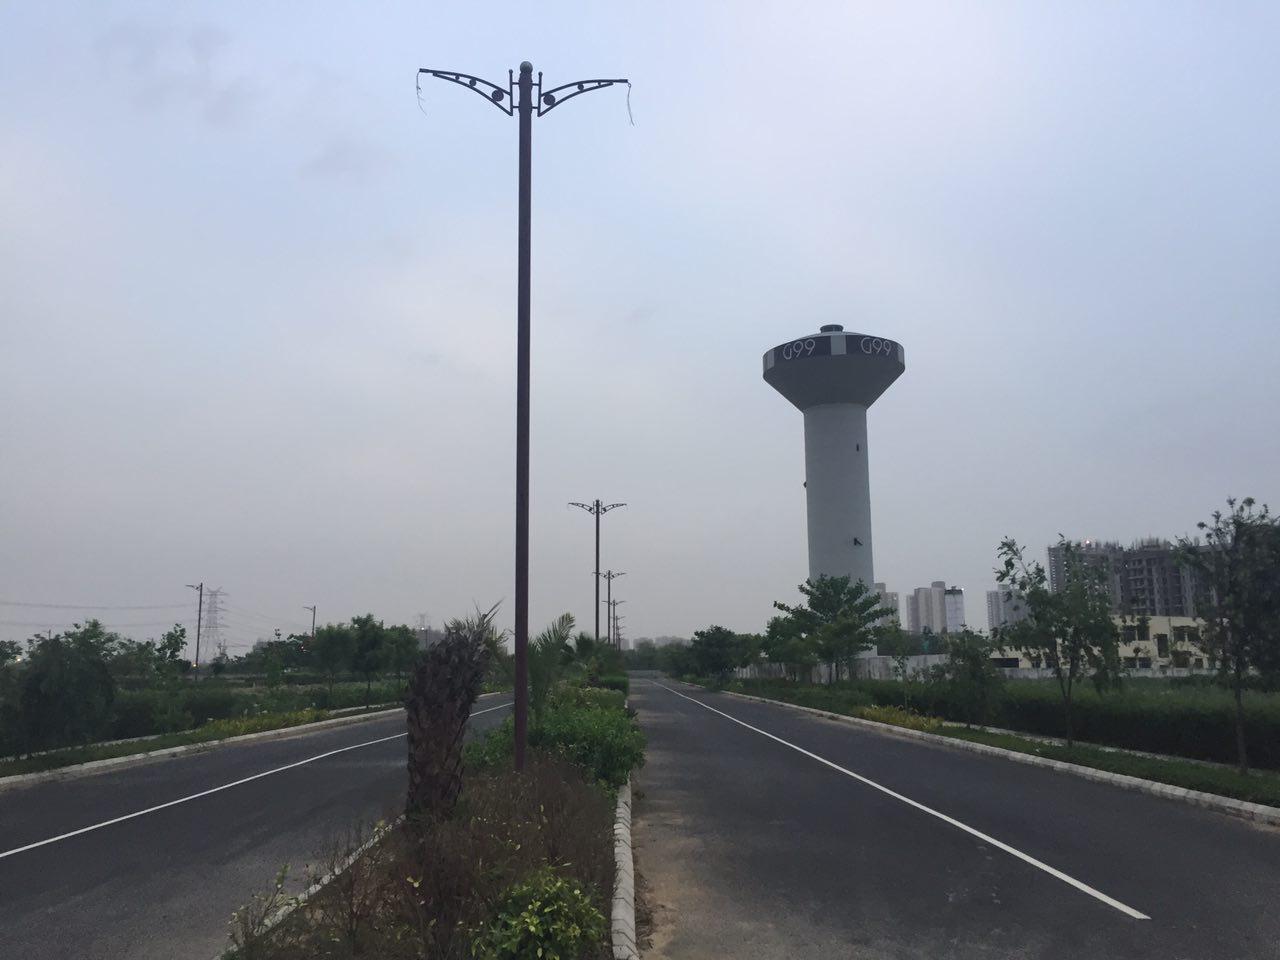 Plot in G99 Qvc Uppal Plots, Sector 99, Gurgaon - Haryana